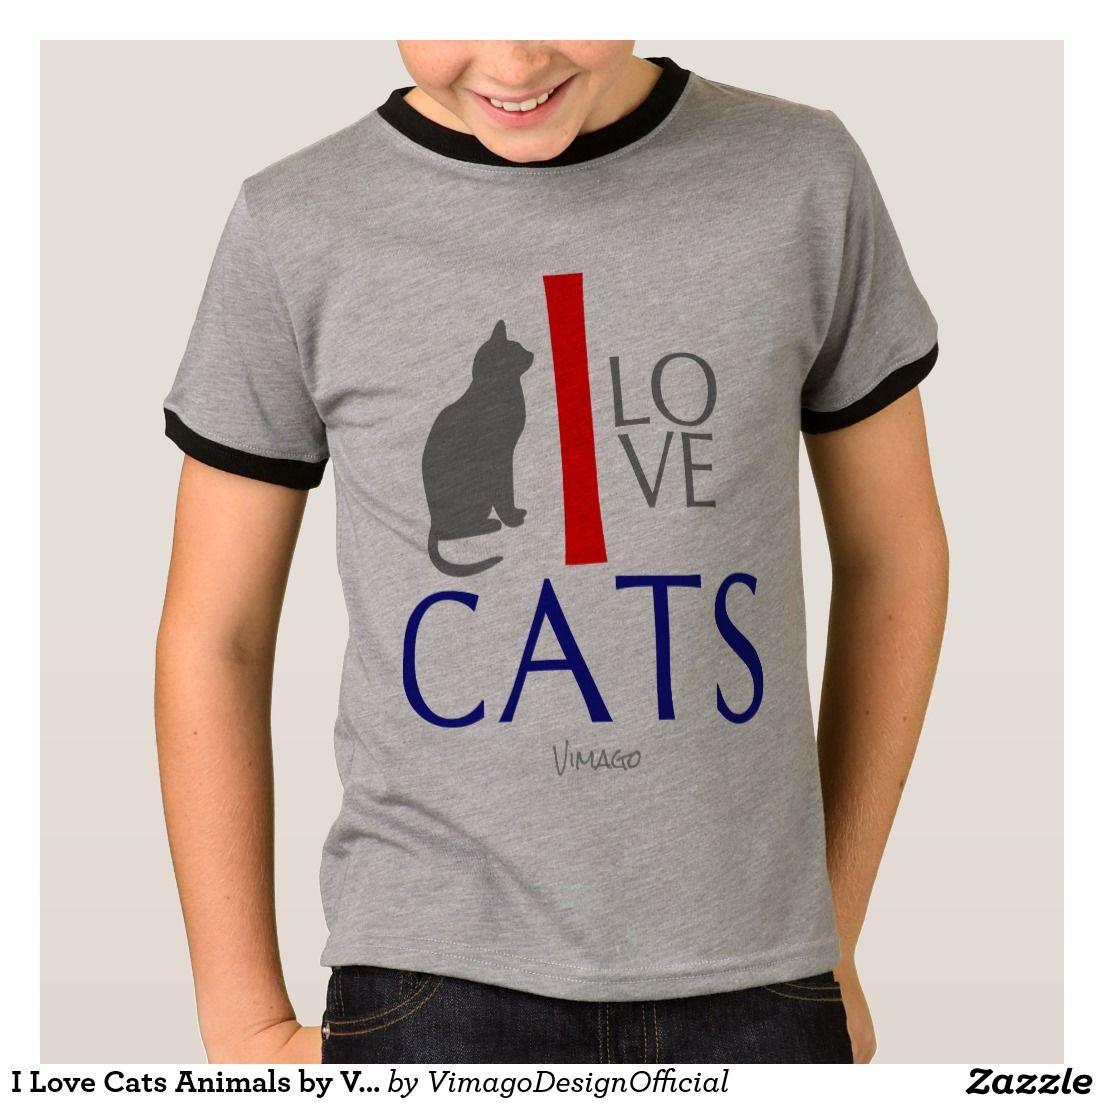 I Love Cats Animals by VIMAGO TShirt